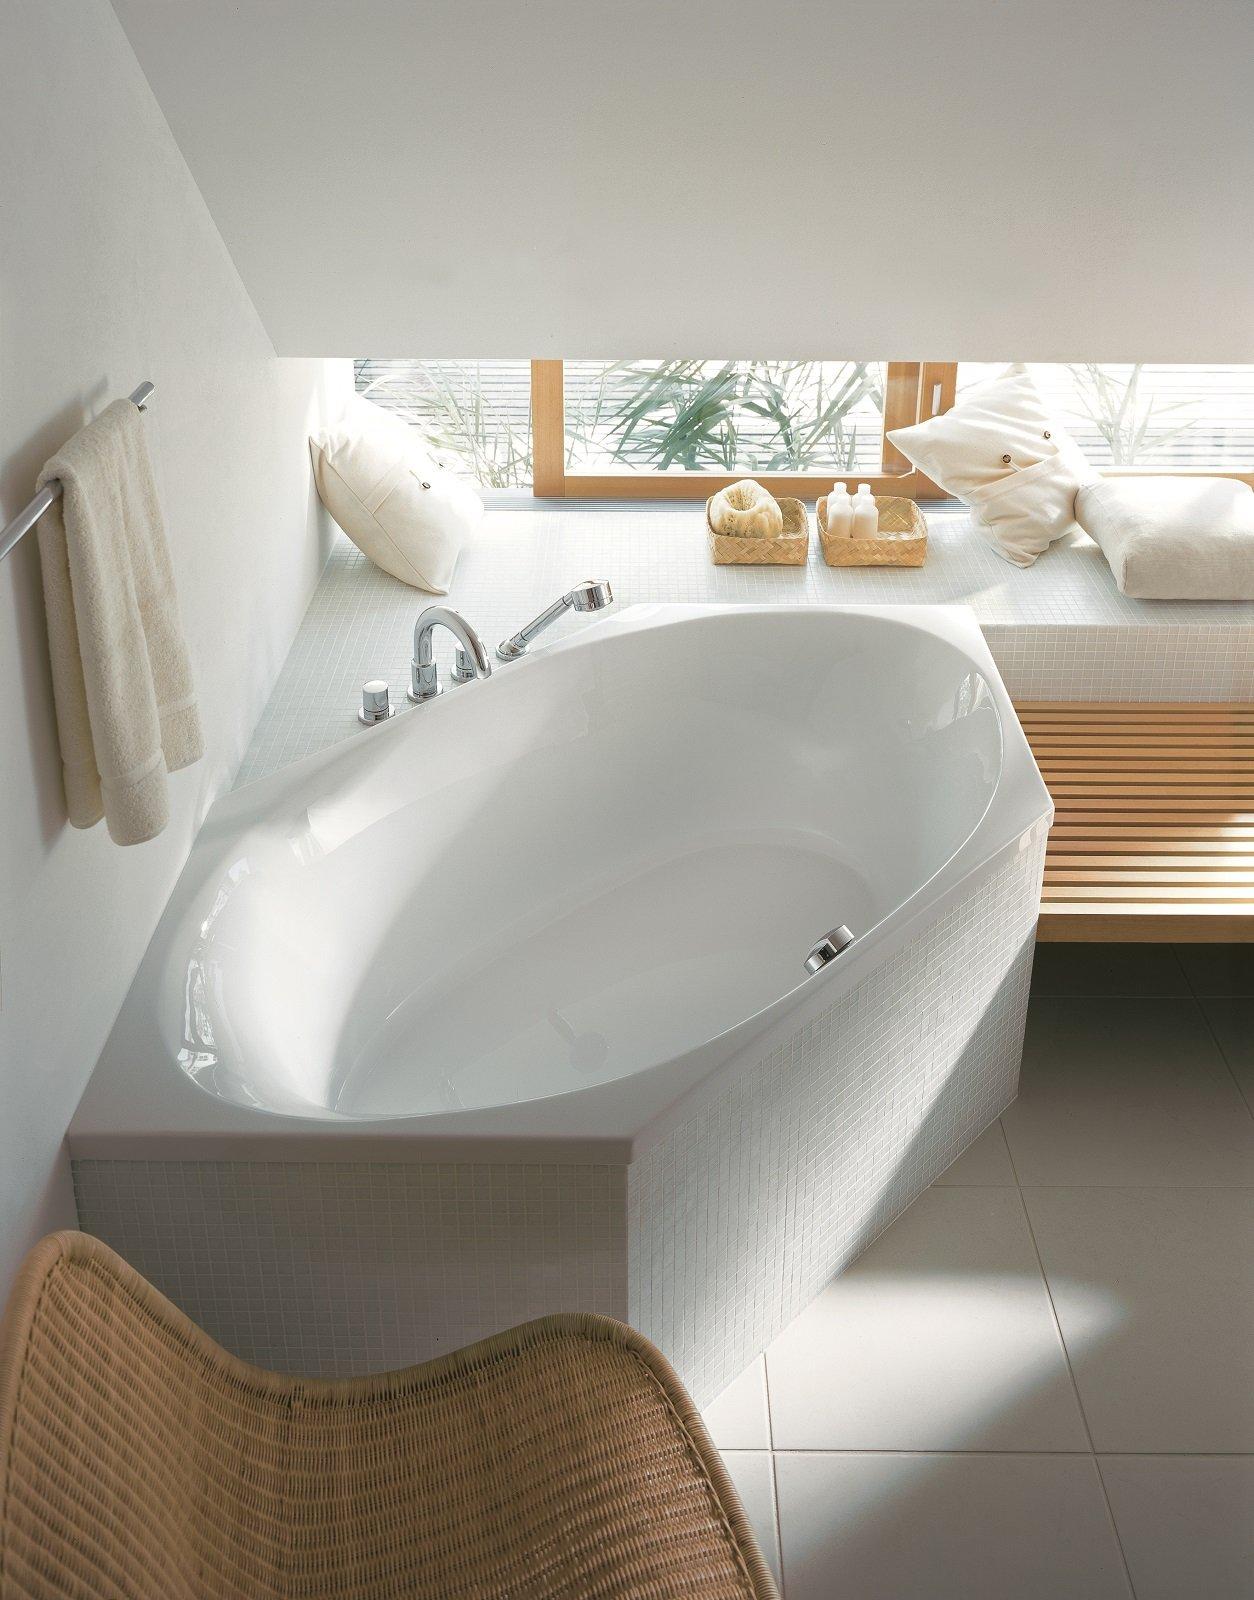 Vasca da bagno angolare piccola cheap vasca da bagno piccola misure nei piccoli bagni spesso - Vasche da bagno dolomite ...